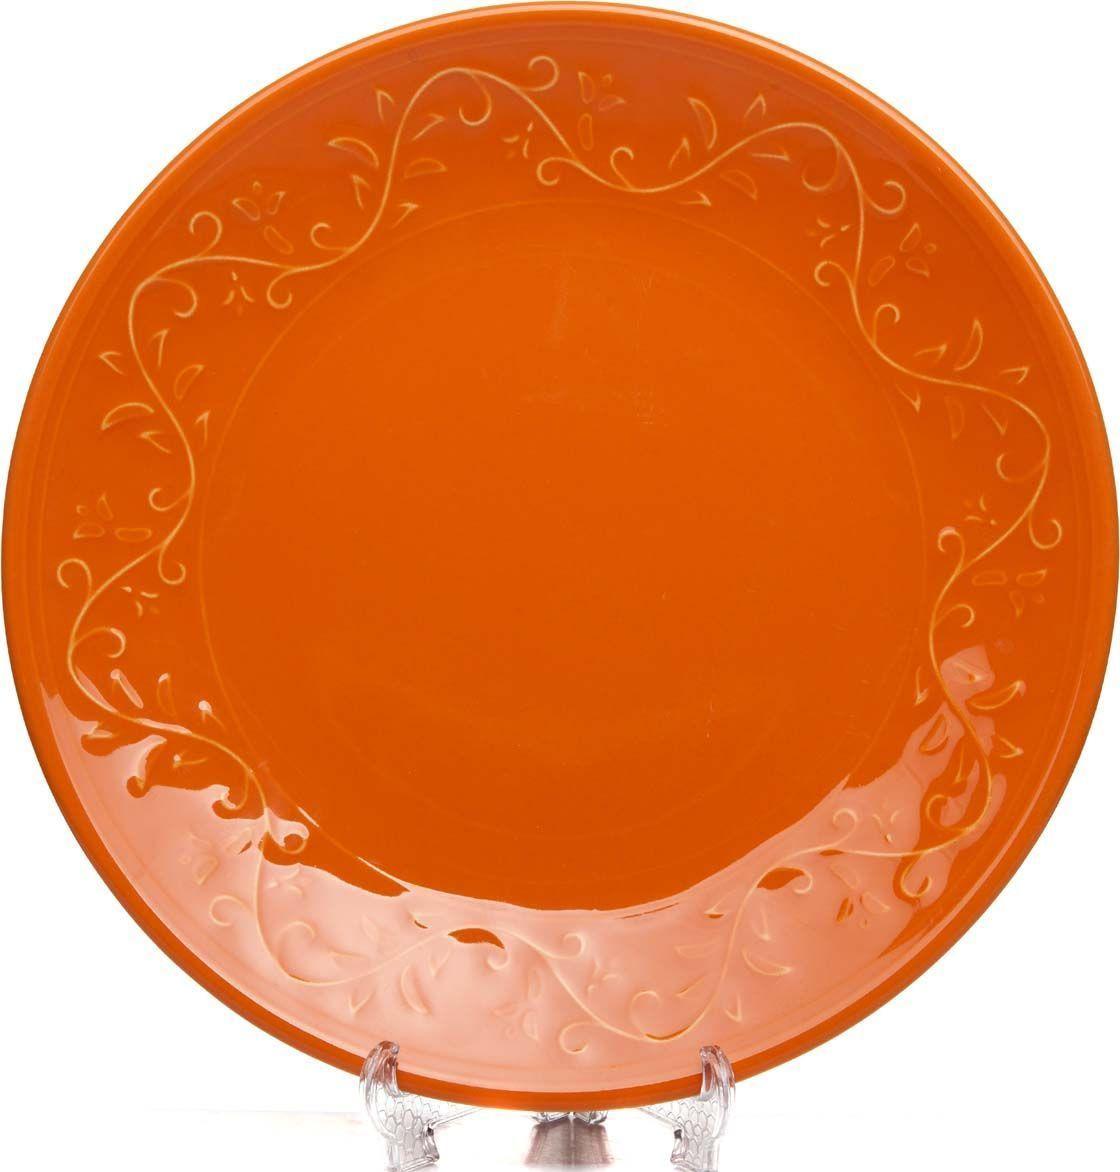 <b>Тарелка Kutahya Porselen IVY</b>, оранжевый, диаметр 26 см ...